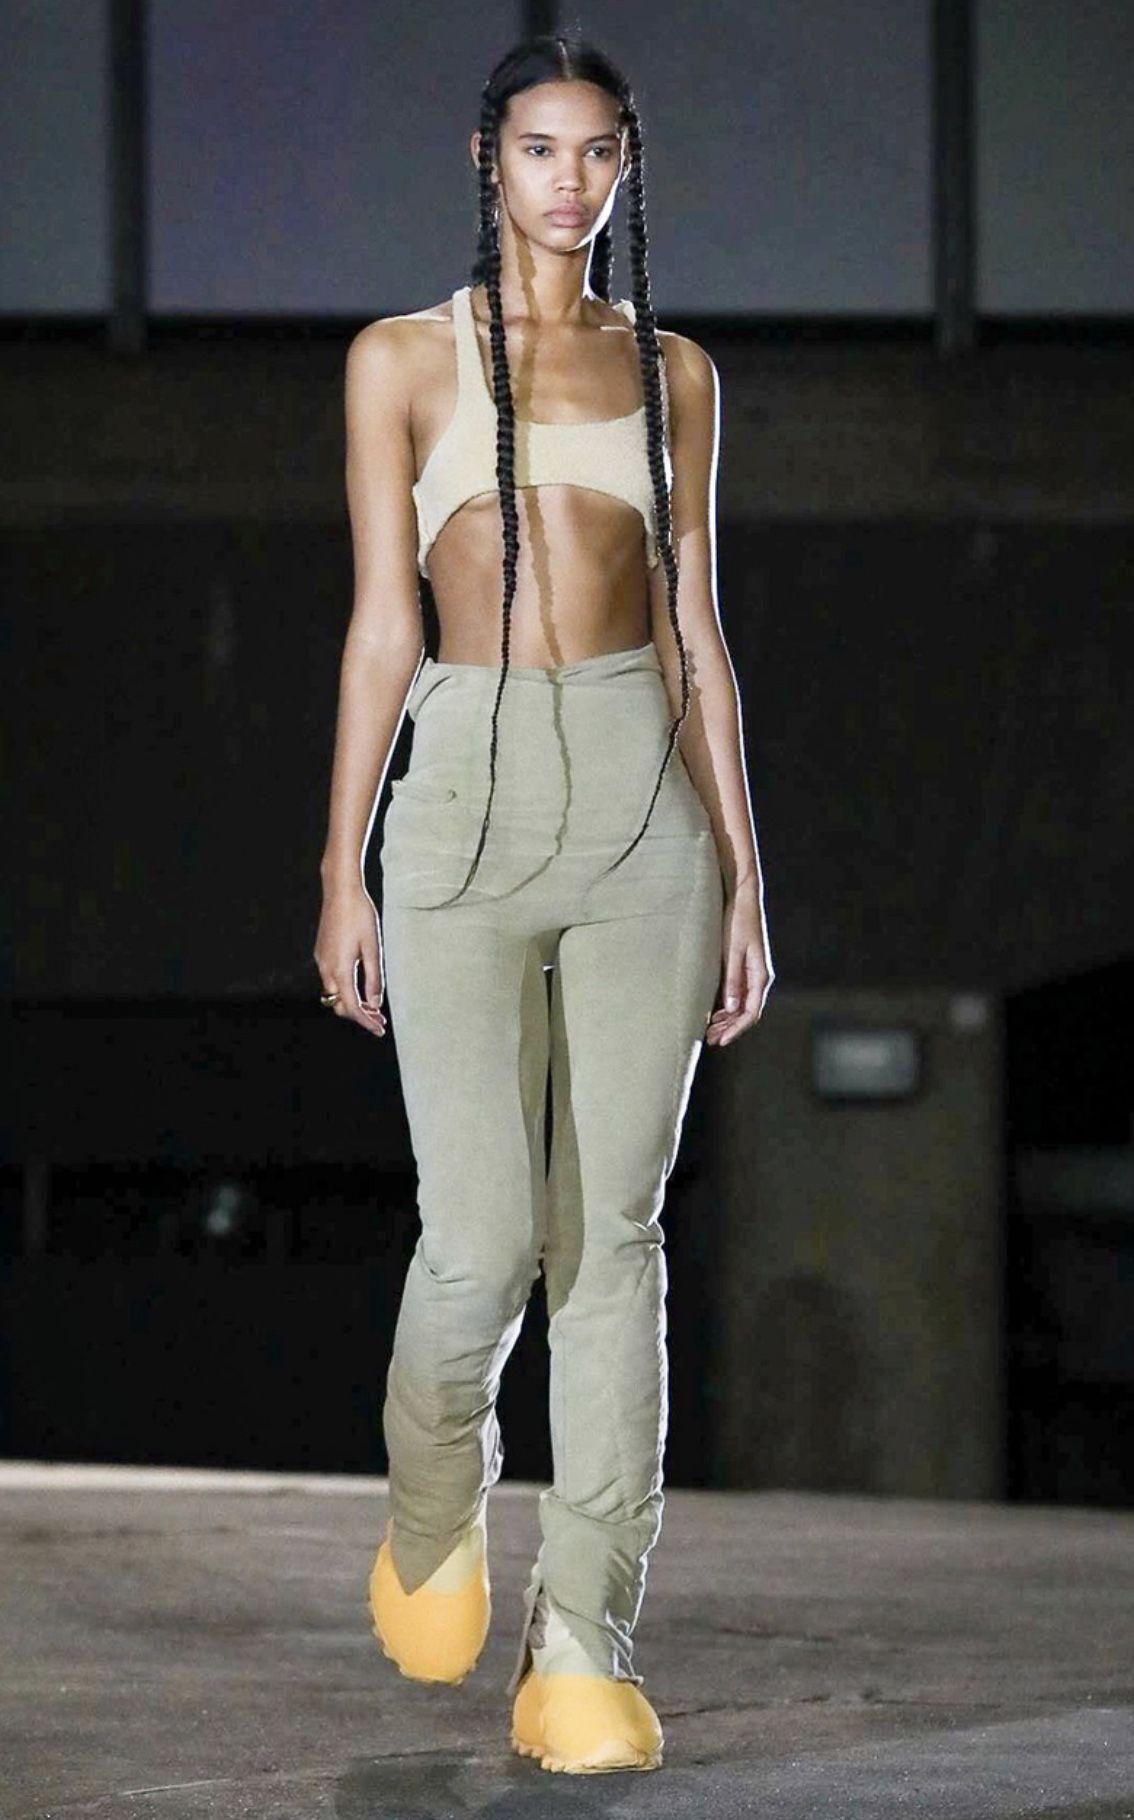 Yeezy Season 8 In 2020 Yeezy Fashion Fashion Yeezy Boots